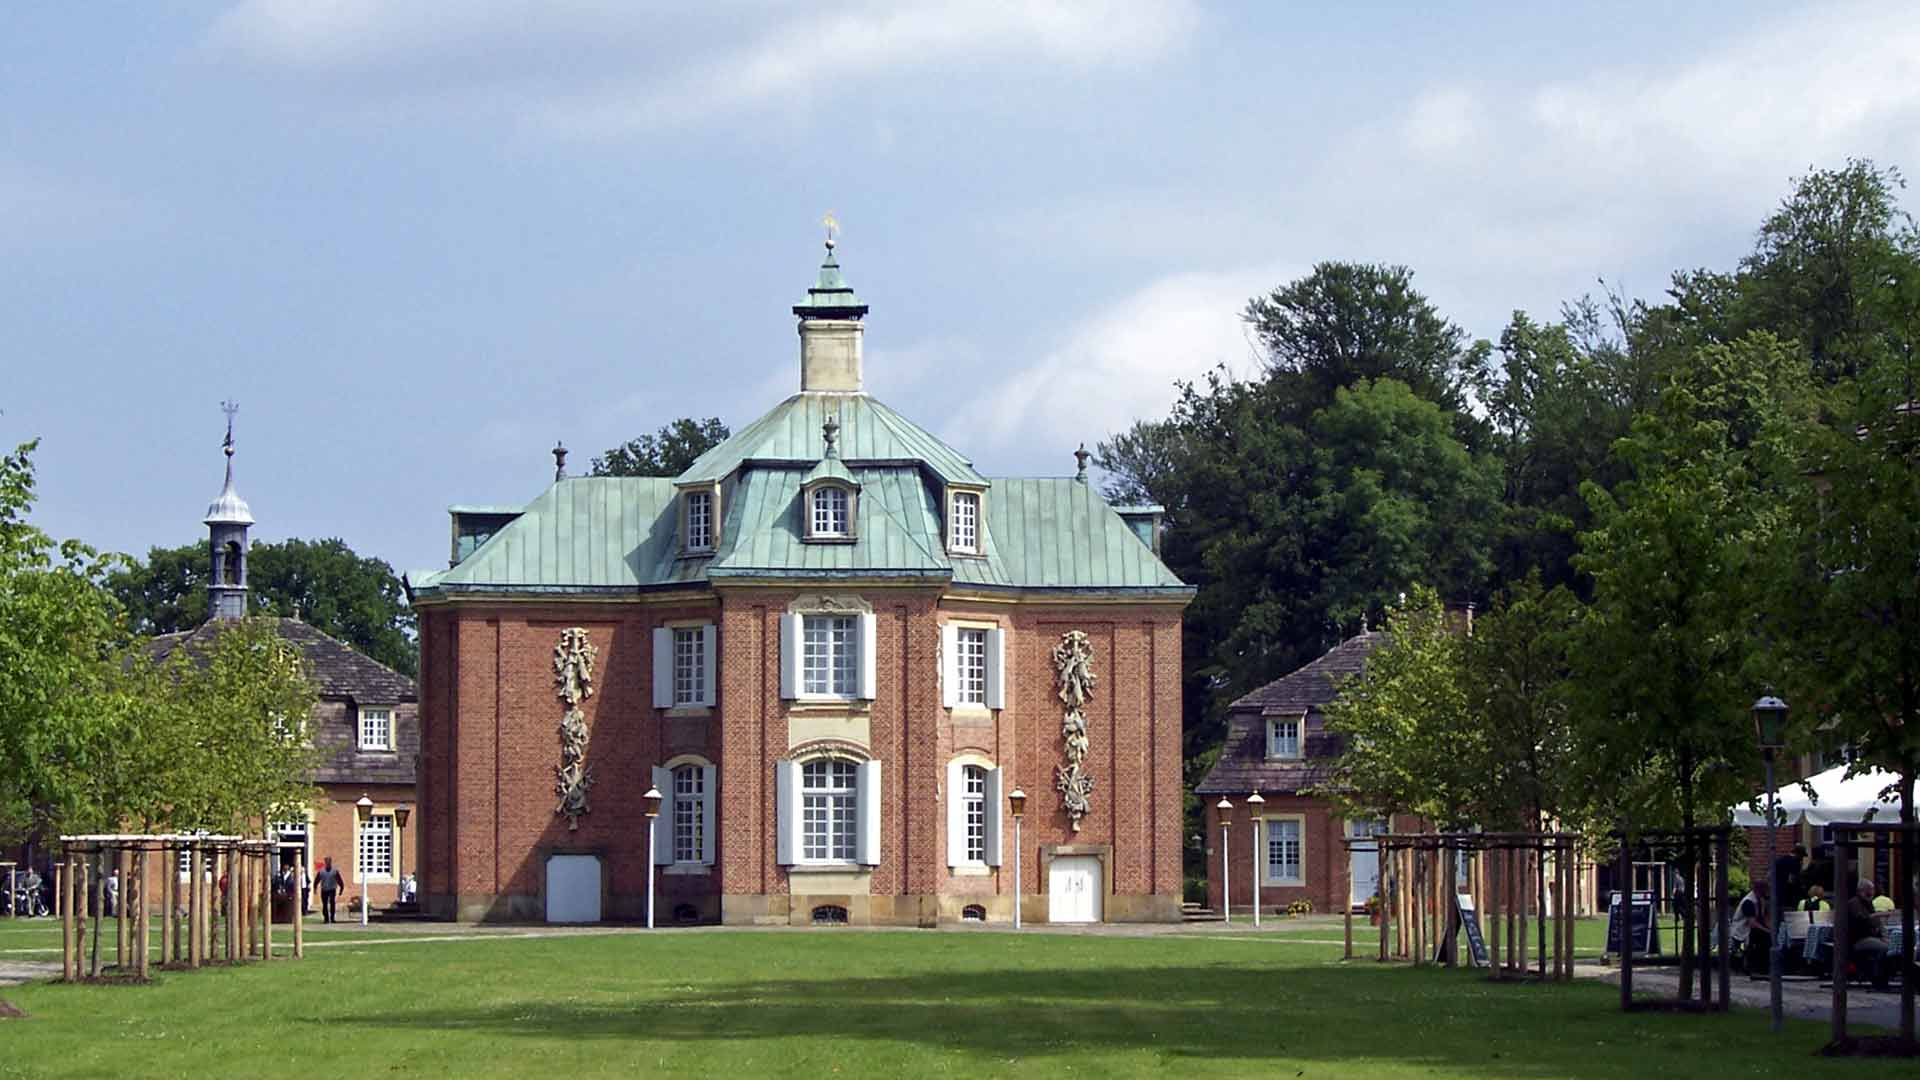 Het prachtige barokke jachtslot Clemenswerth in het Emsland.